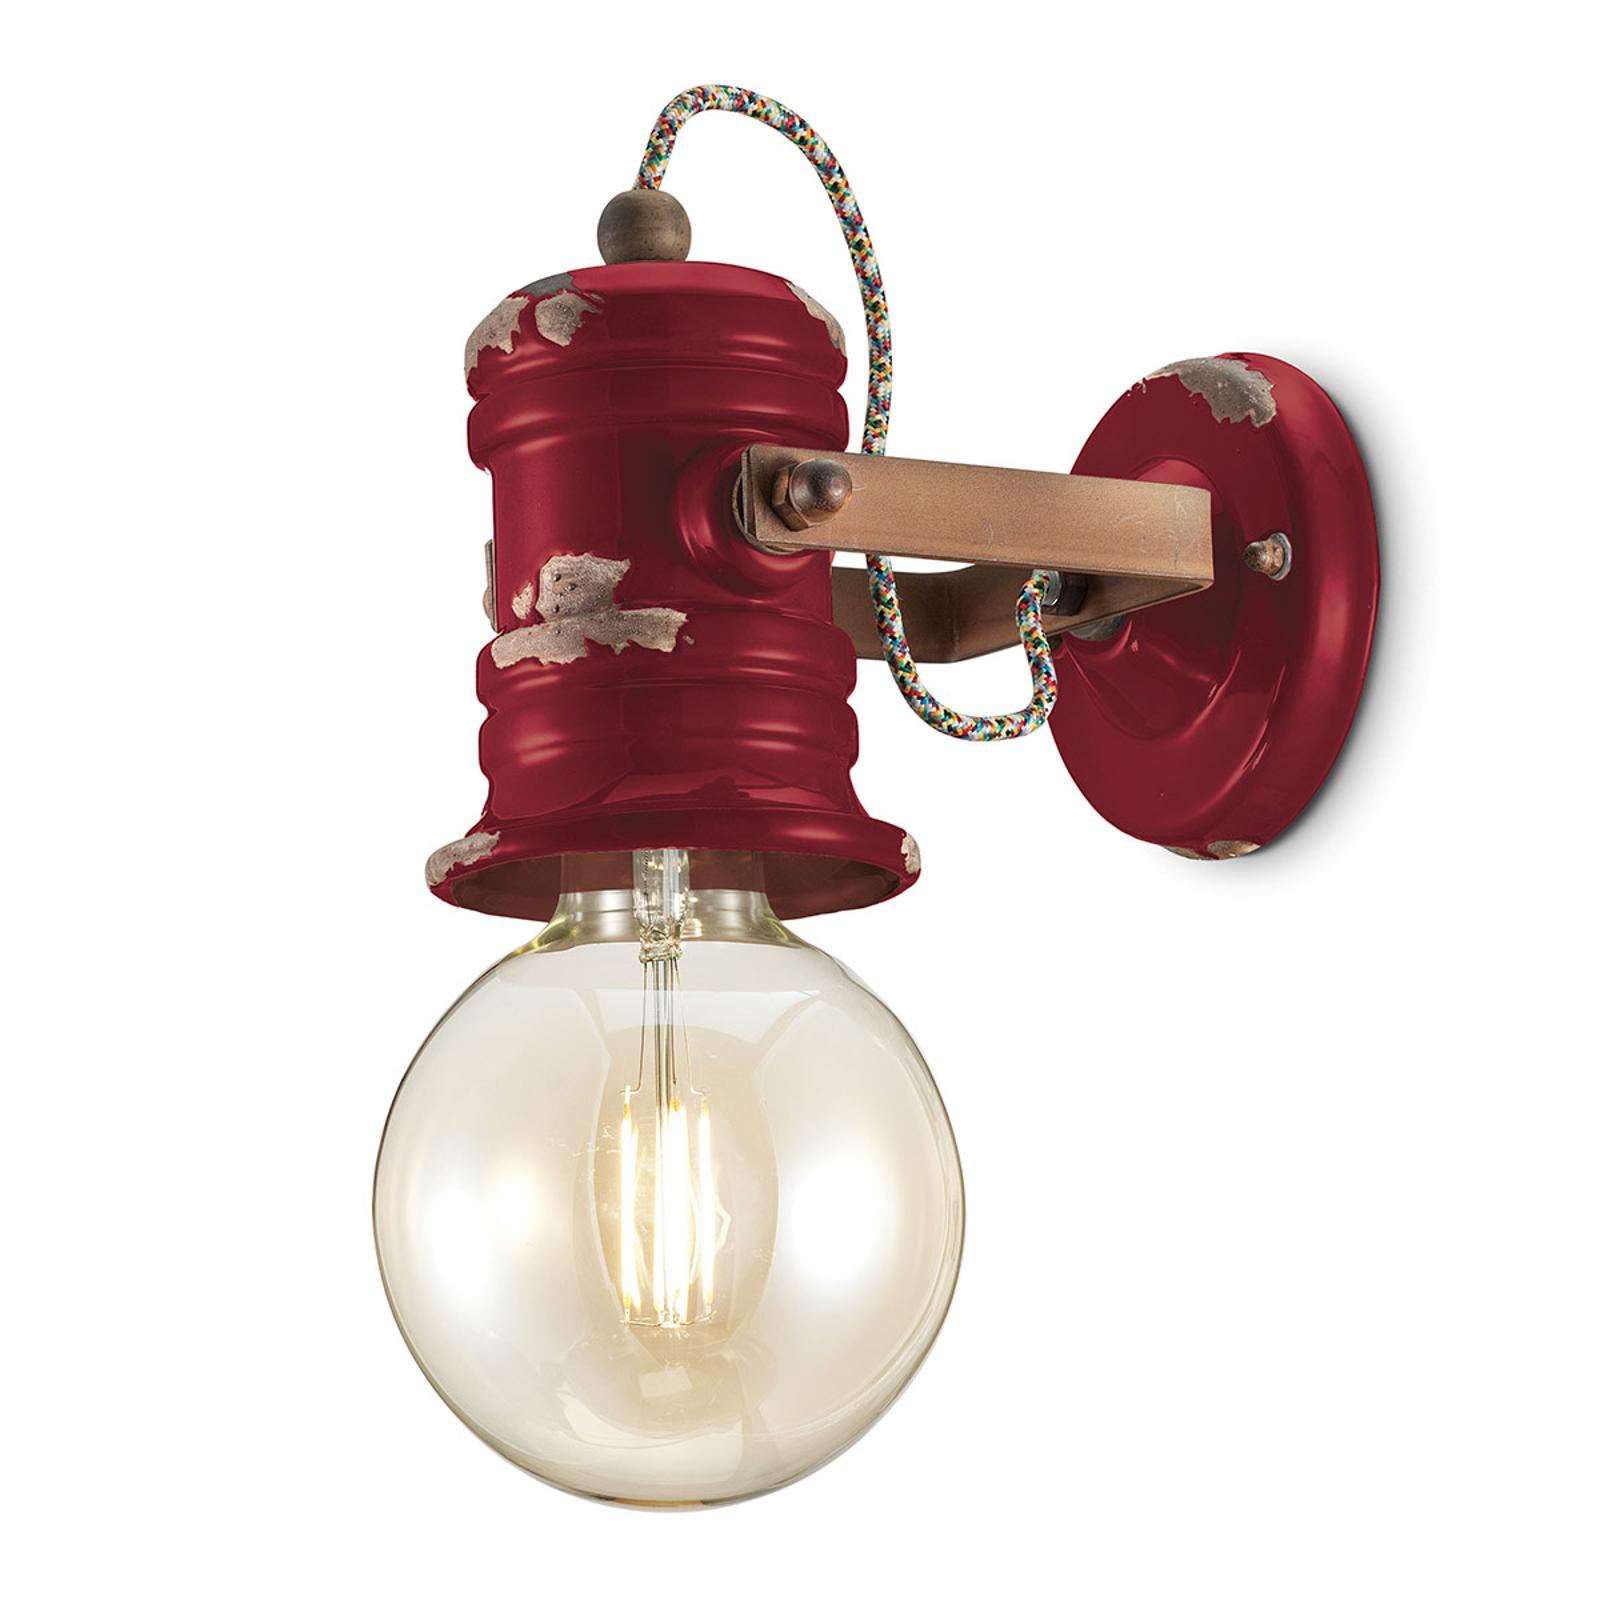 Wandlamp C1843 in vintage design wijnrood